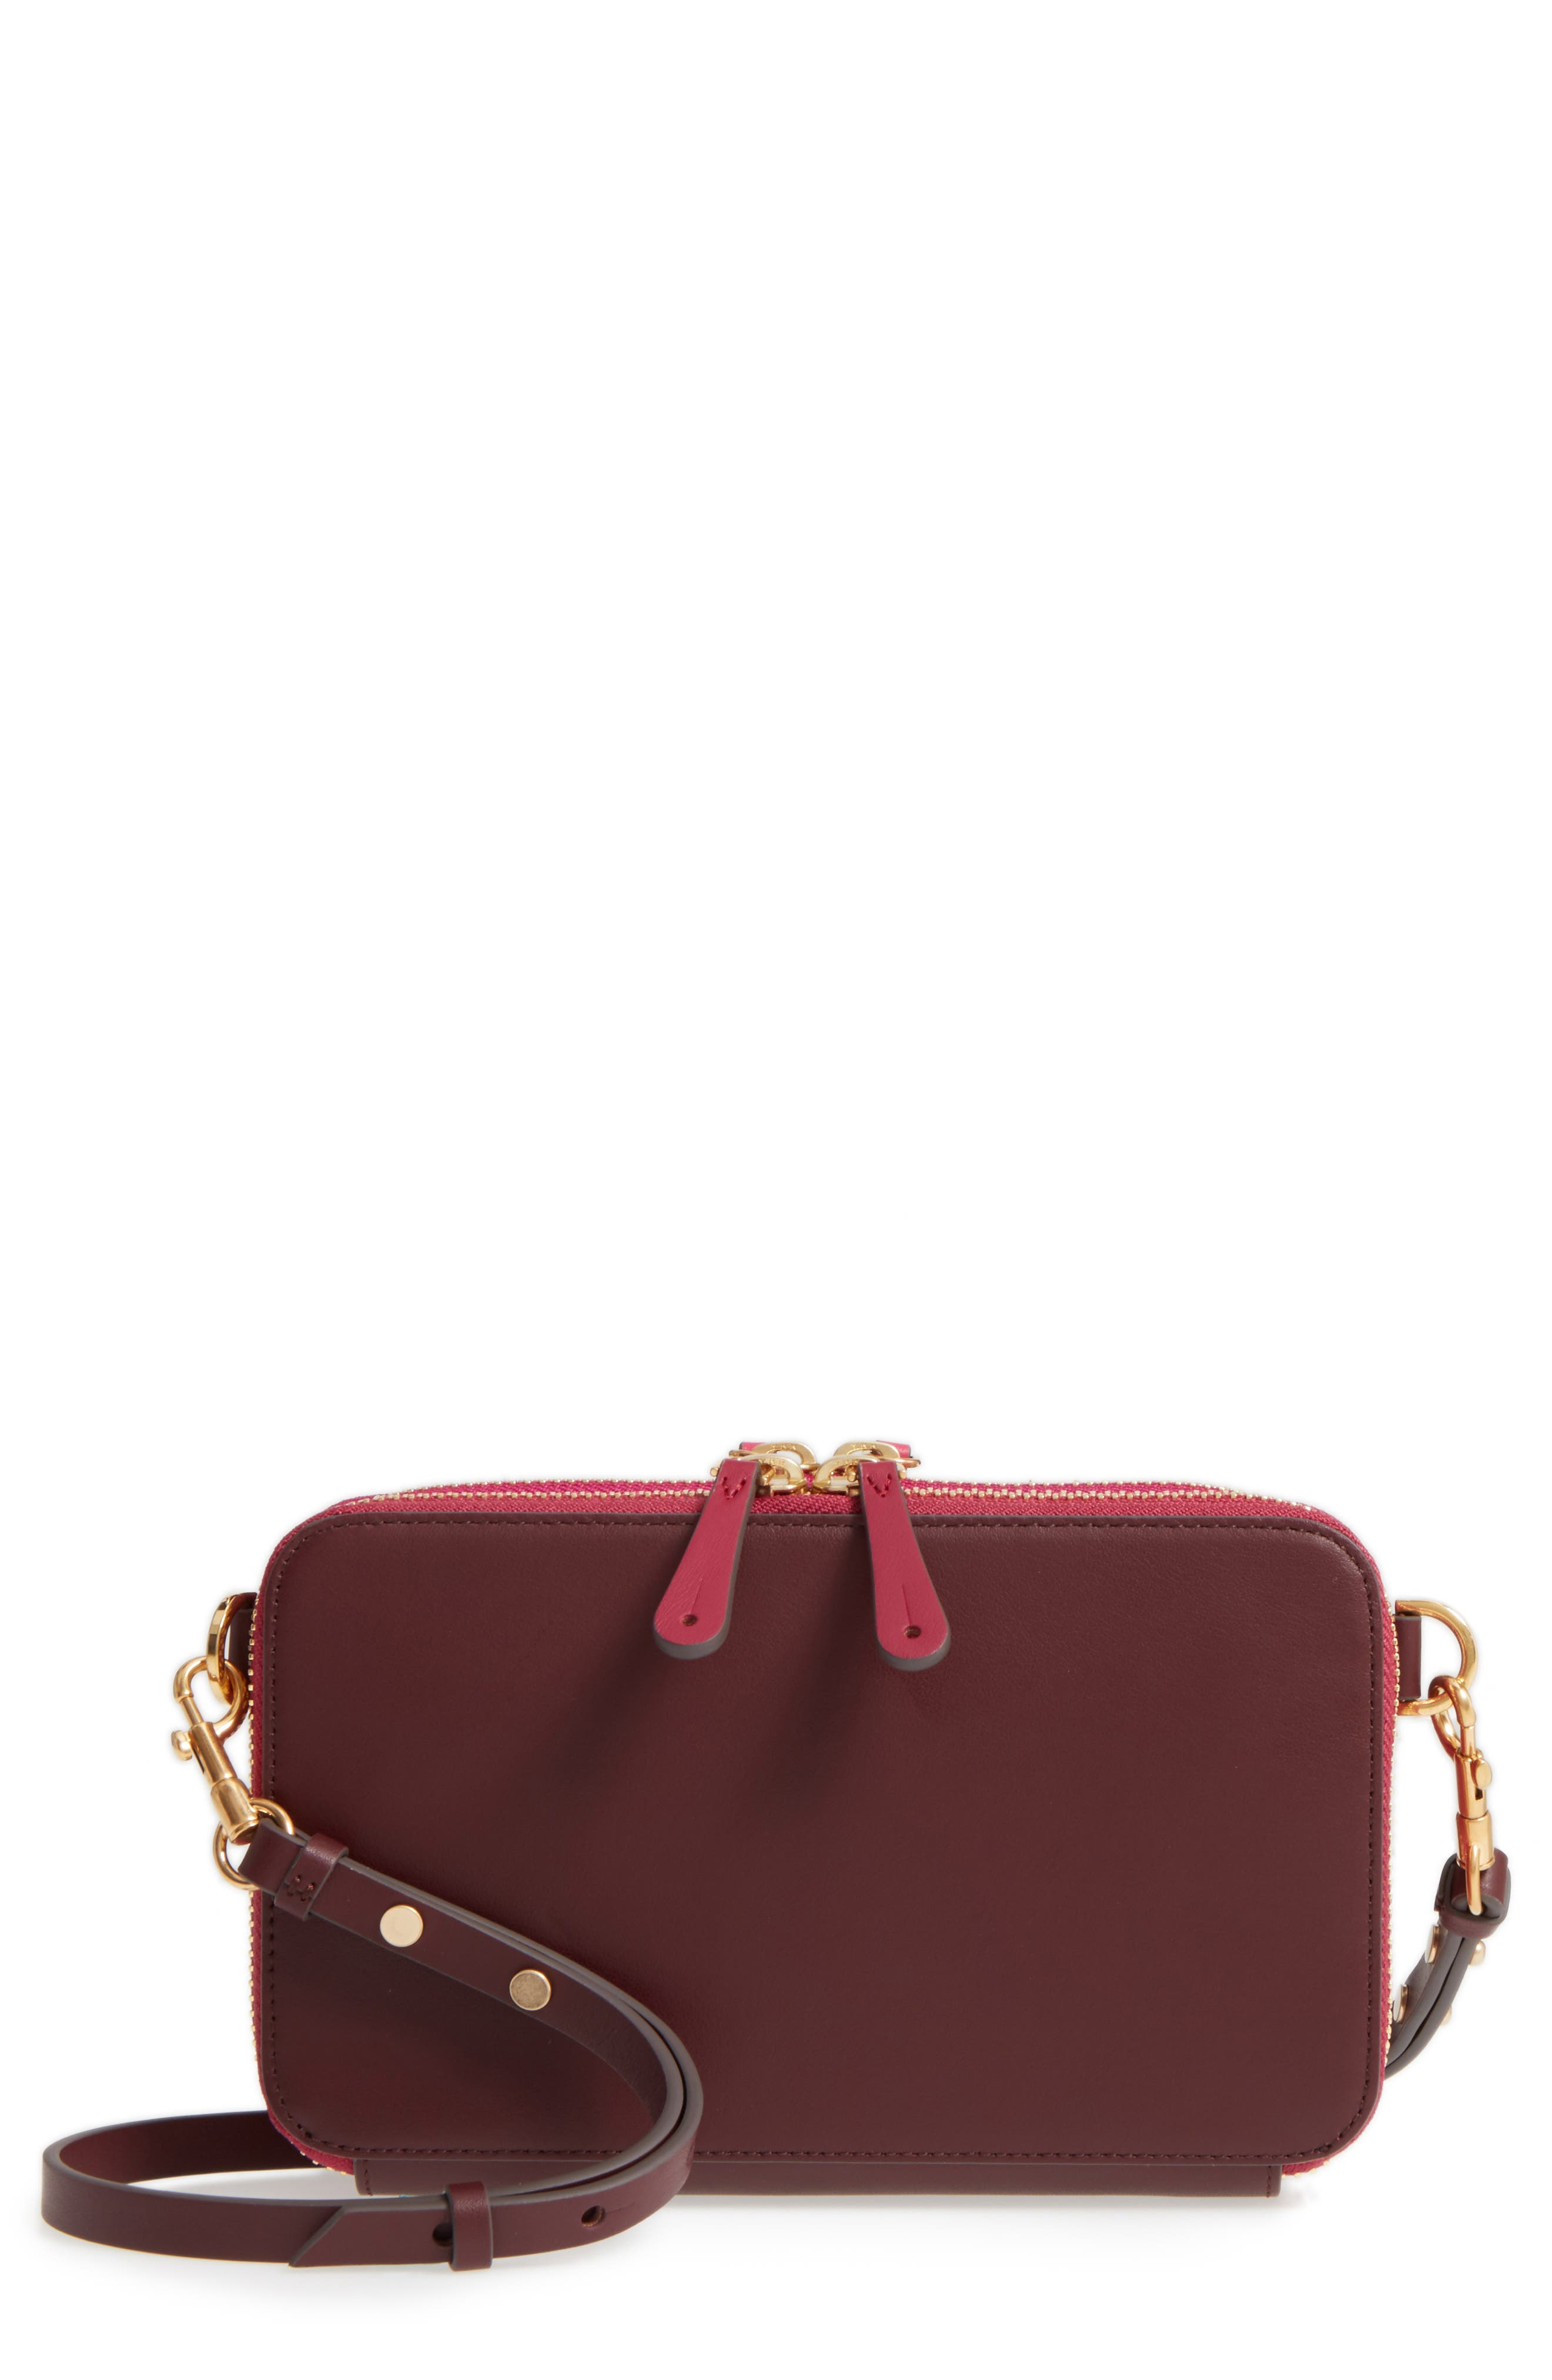 Main Image - Anya Hindmarch Stack Leather Crossbody Wallet